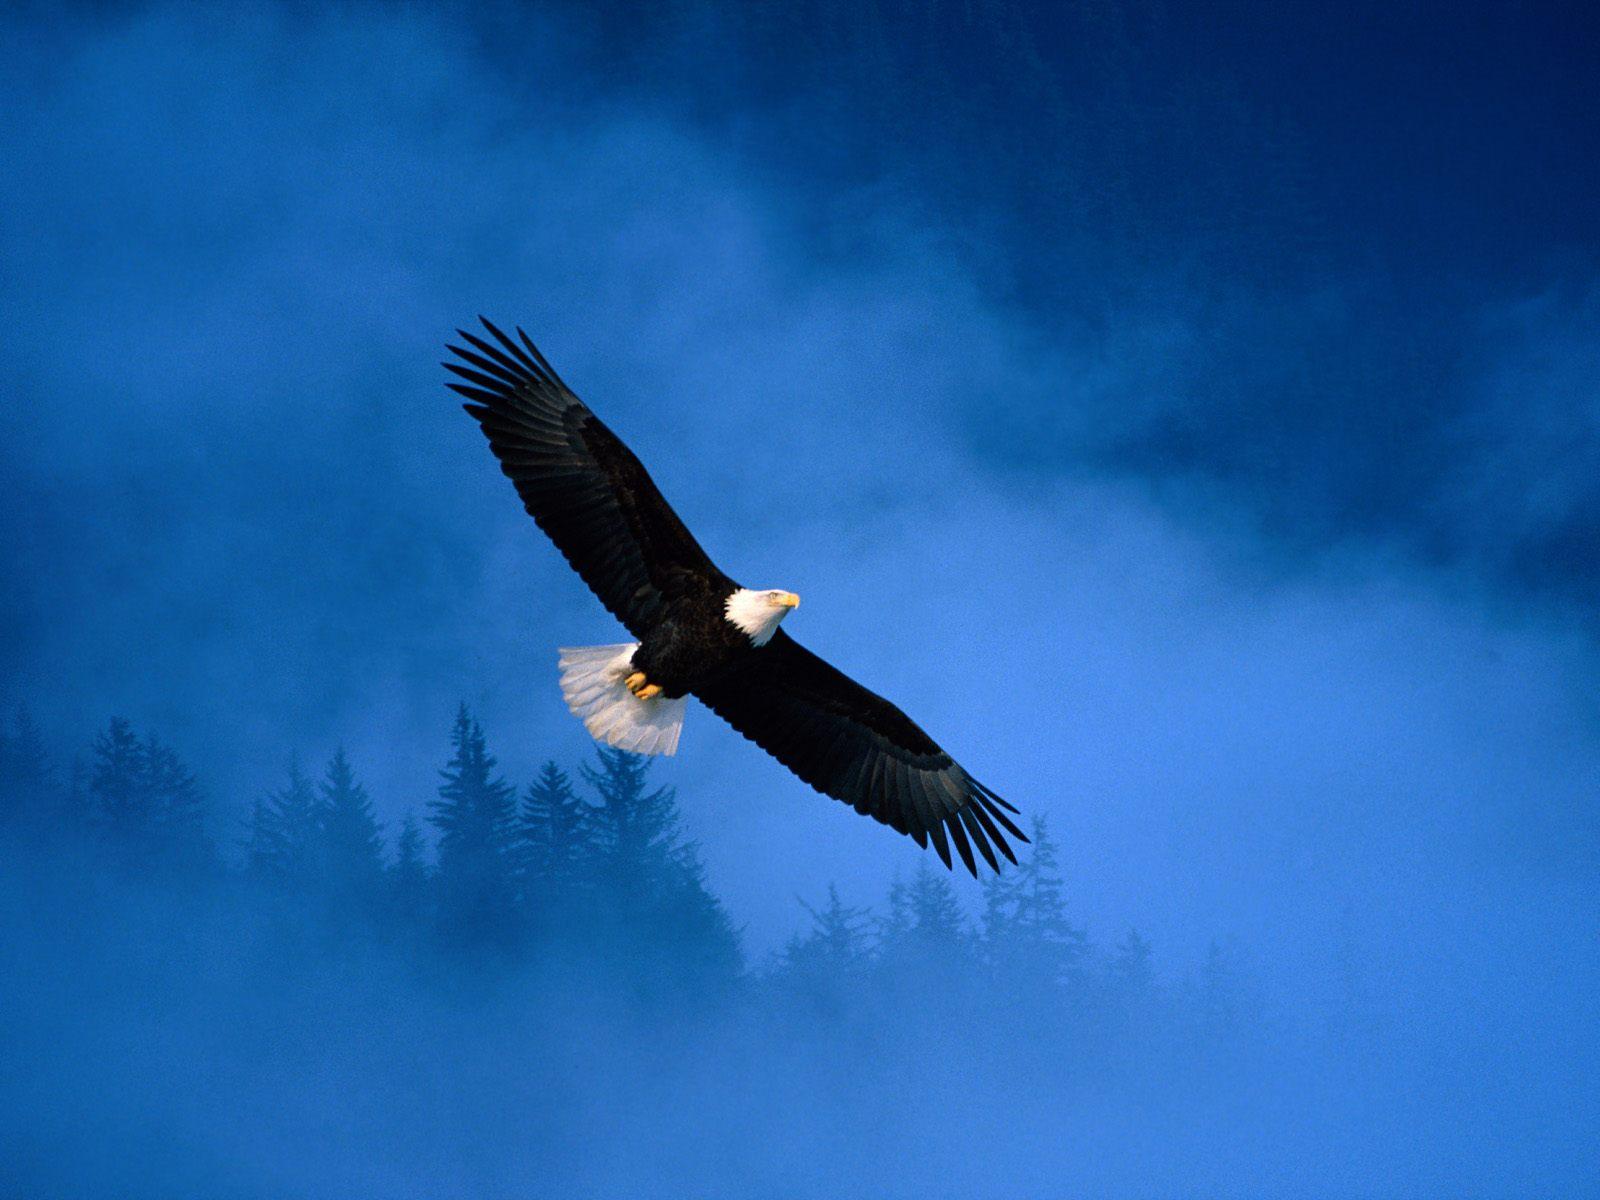 Free Wallpapers Blog Bald Eagle Wallpaper